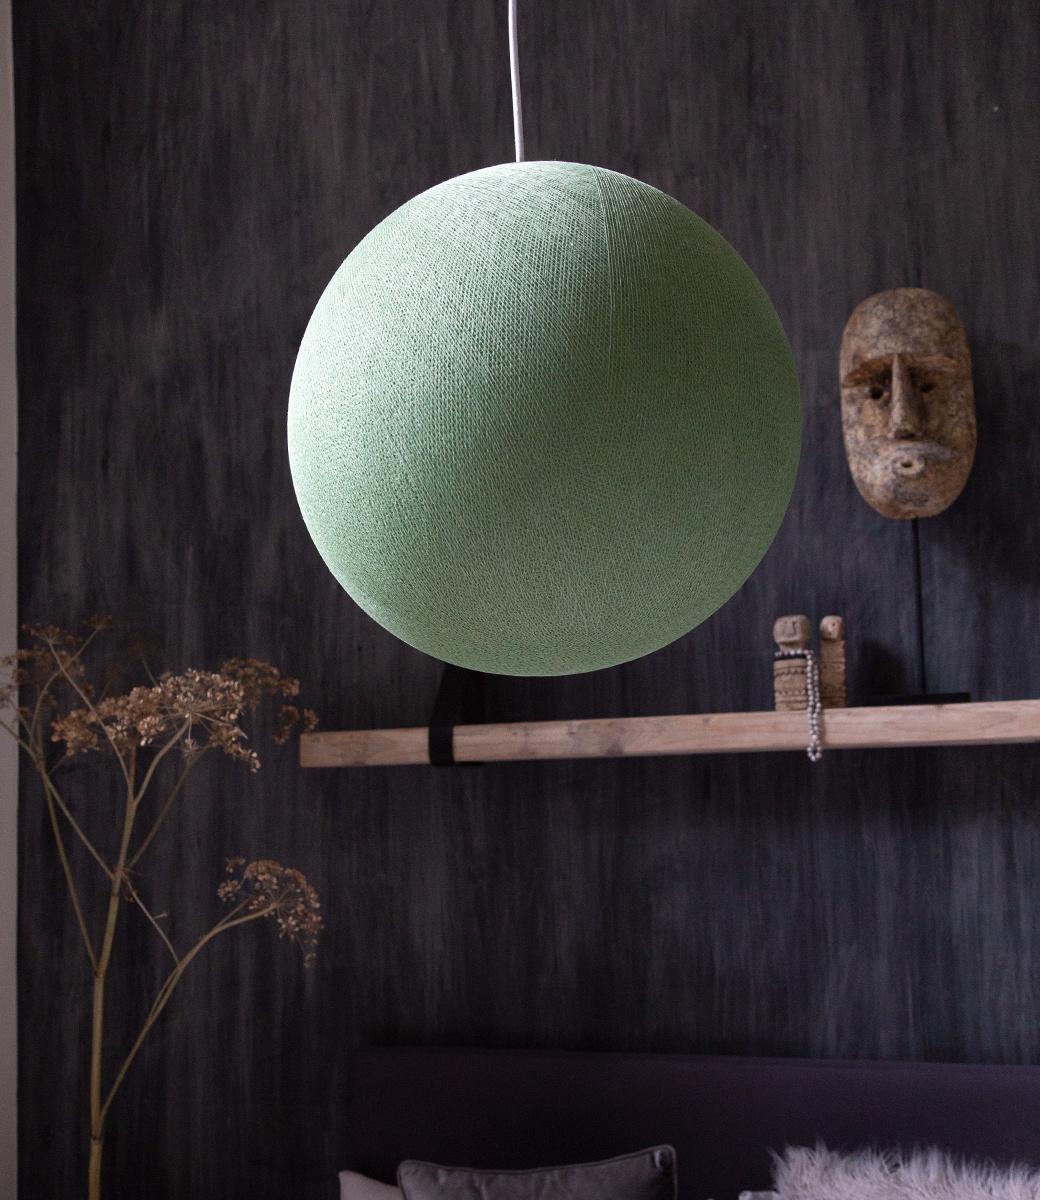 Cotton Ball Lights enkelvoudige hanglamp groen - Powder Green